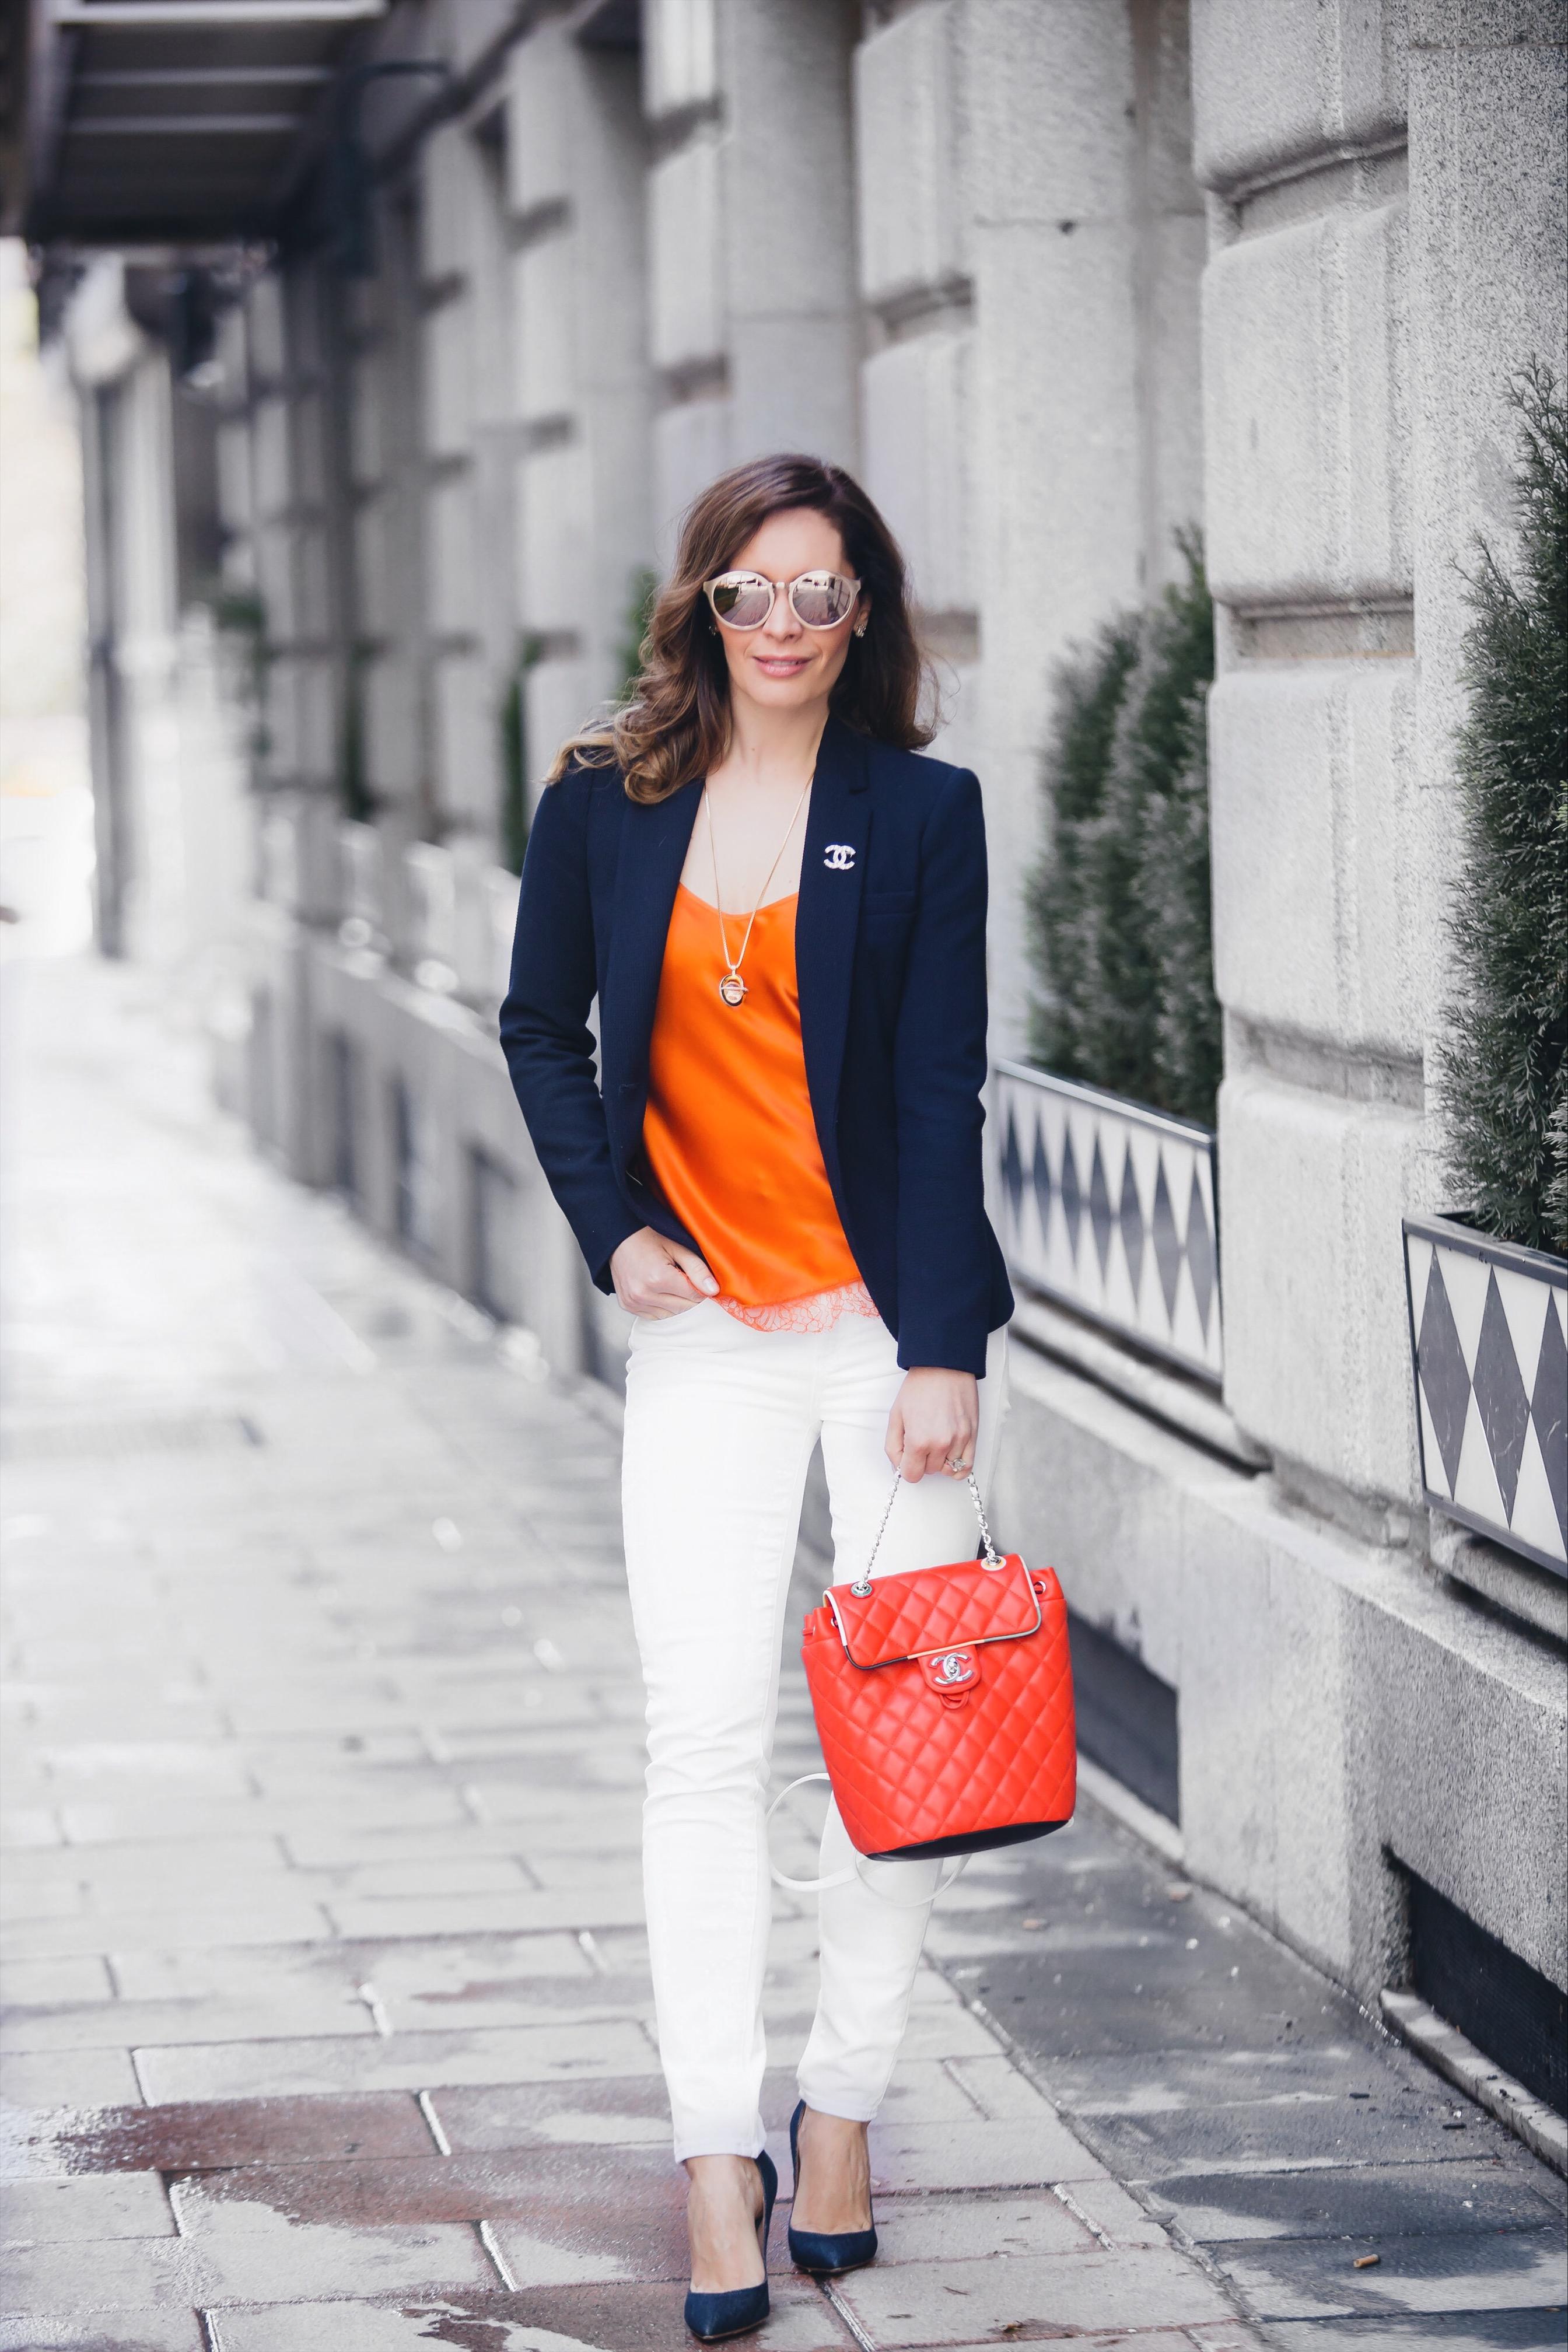 Chanel backpack Lingerie top